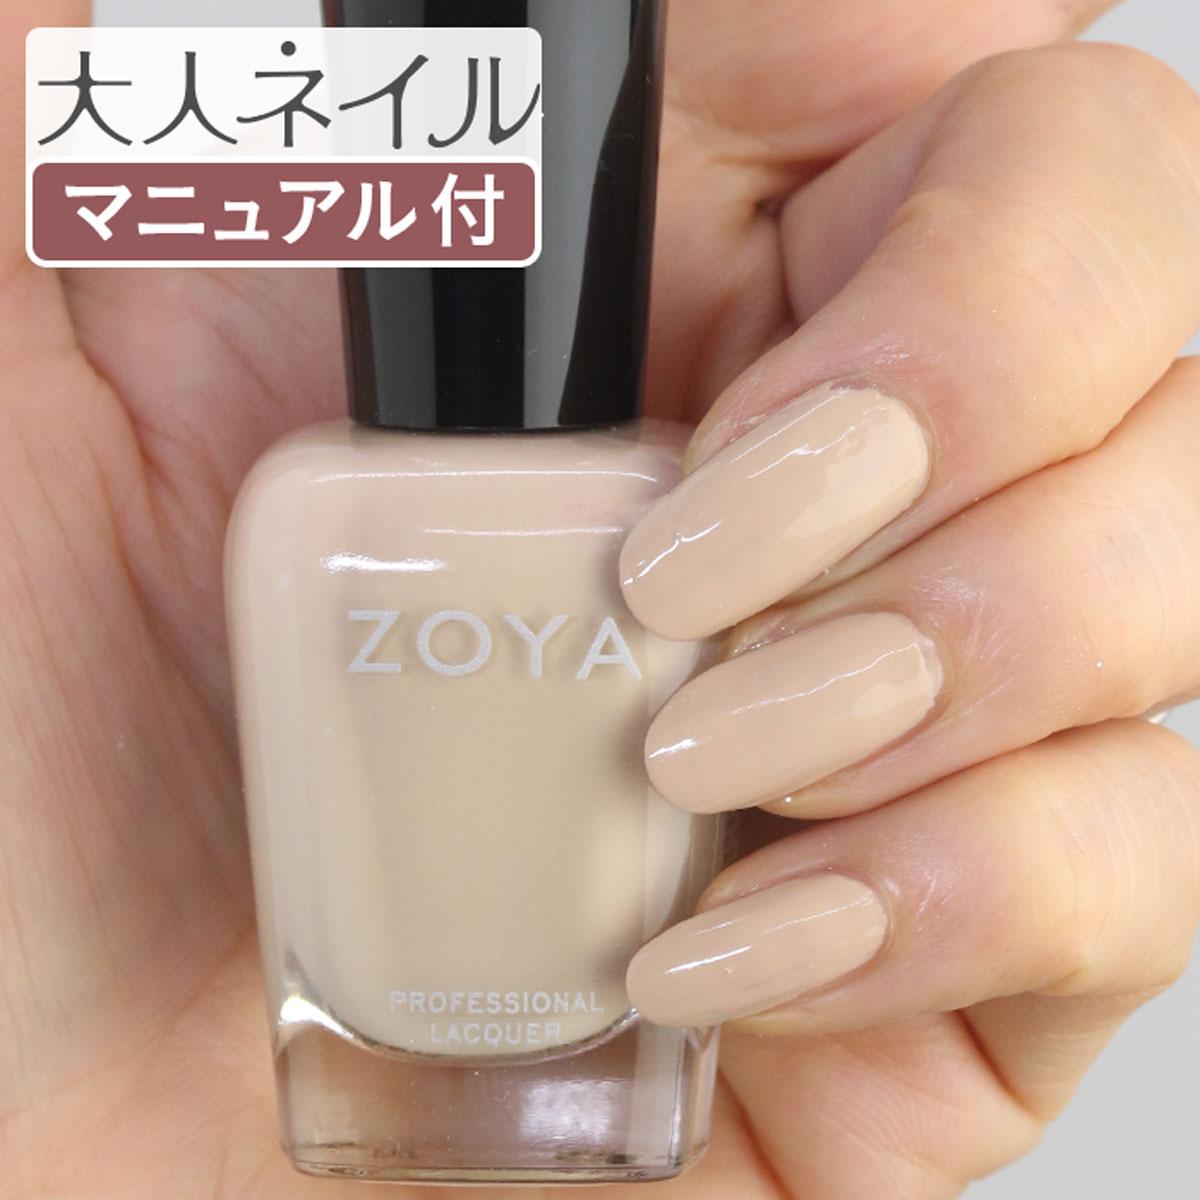 ZOYA ゾーヤ ゾヤ ネイルカラー ZP877 15mL Tatum naturel3 自爪 の為に作られた ネイル にやさしい 自然派 マニキュア zoya セルフネイル にもおすすめ ライトベージュ オフィス ナチュラル